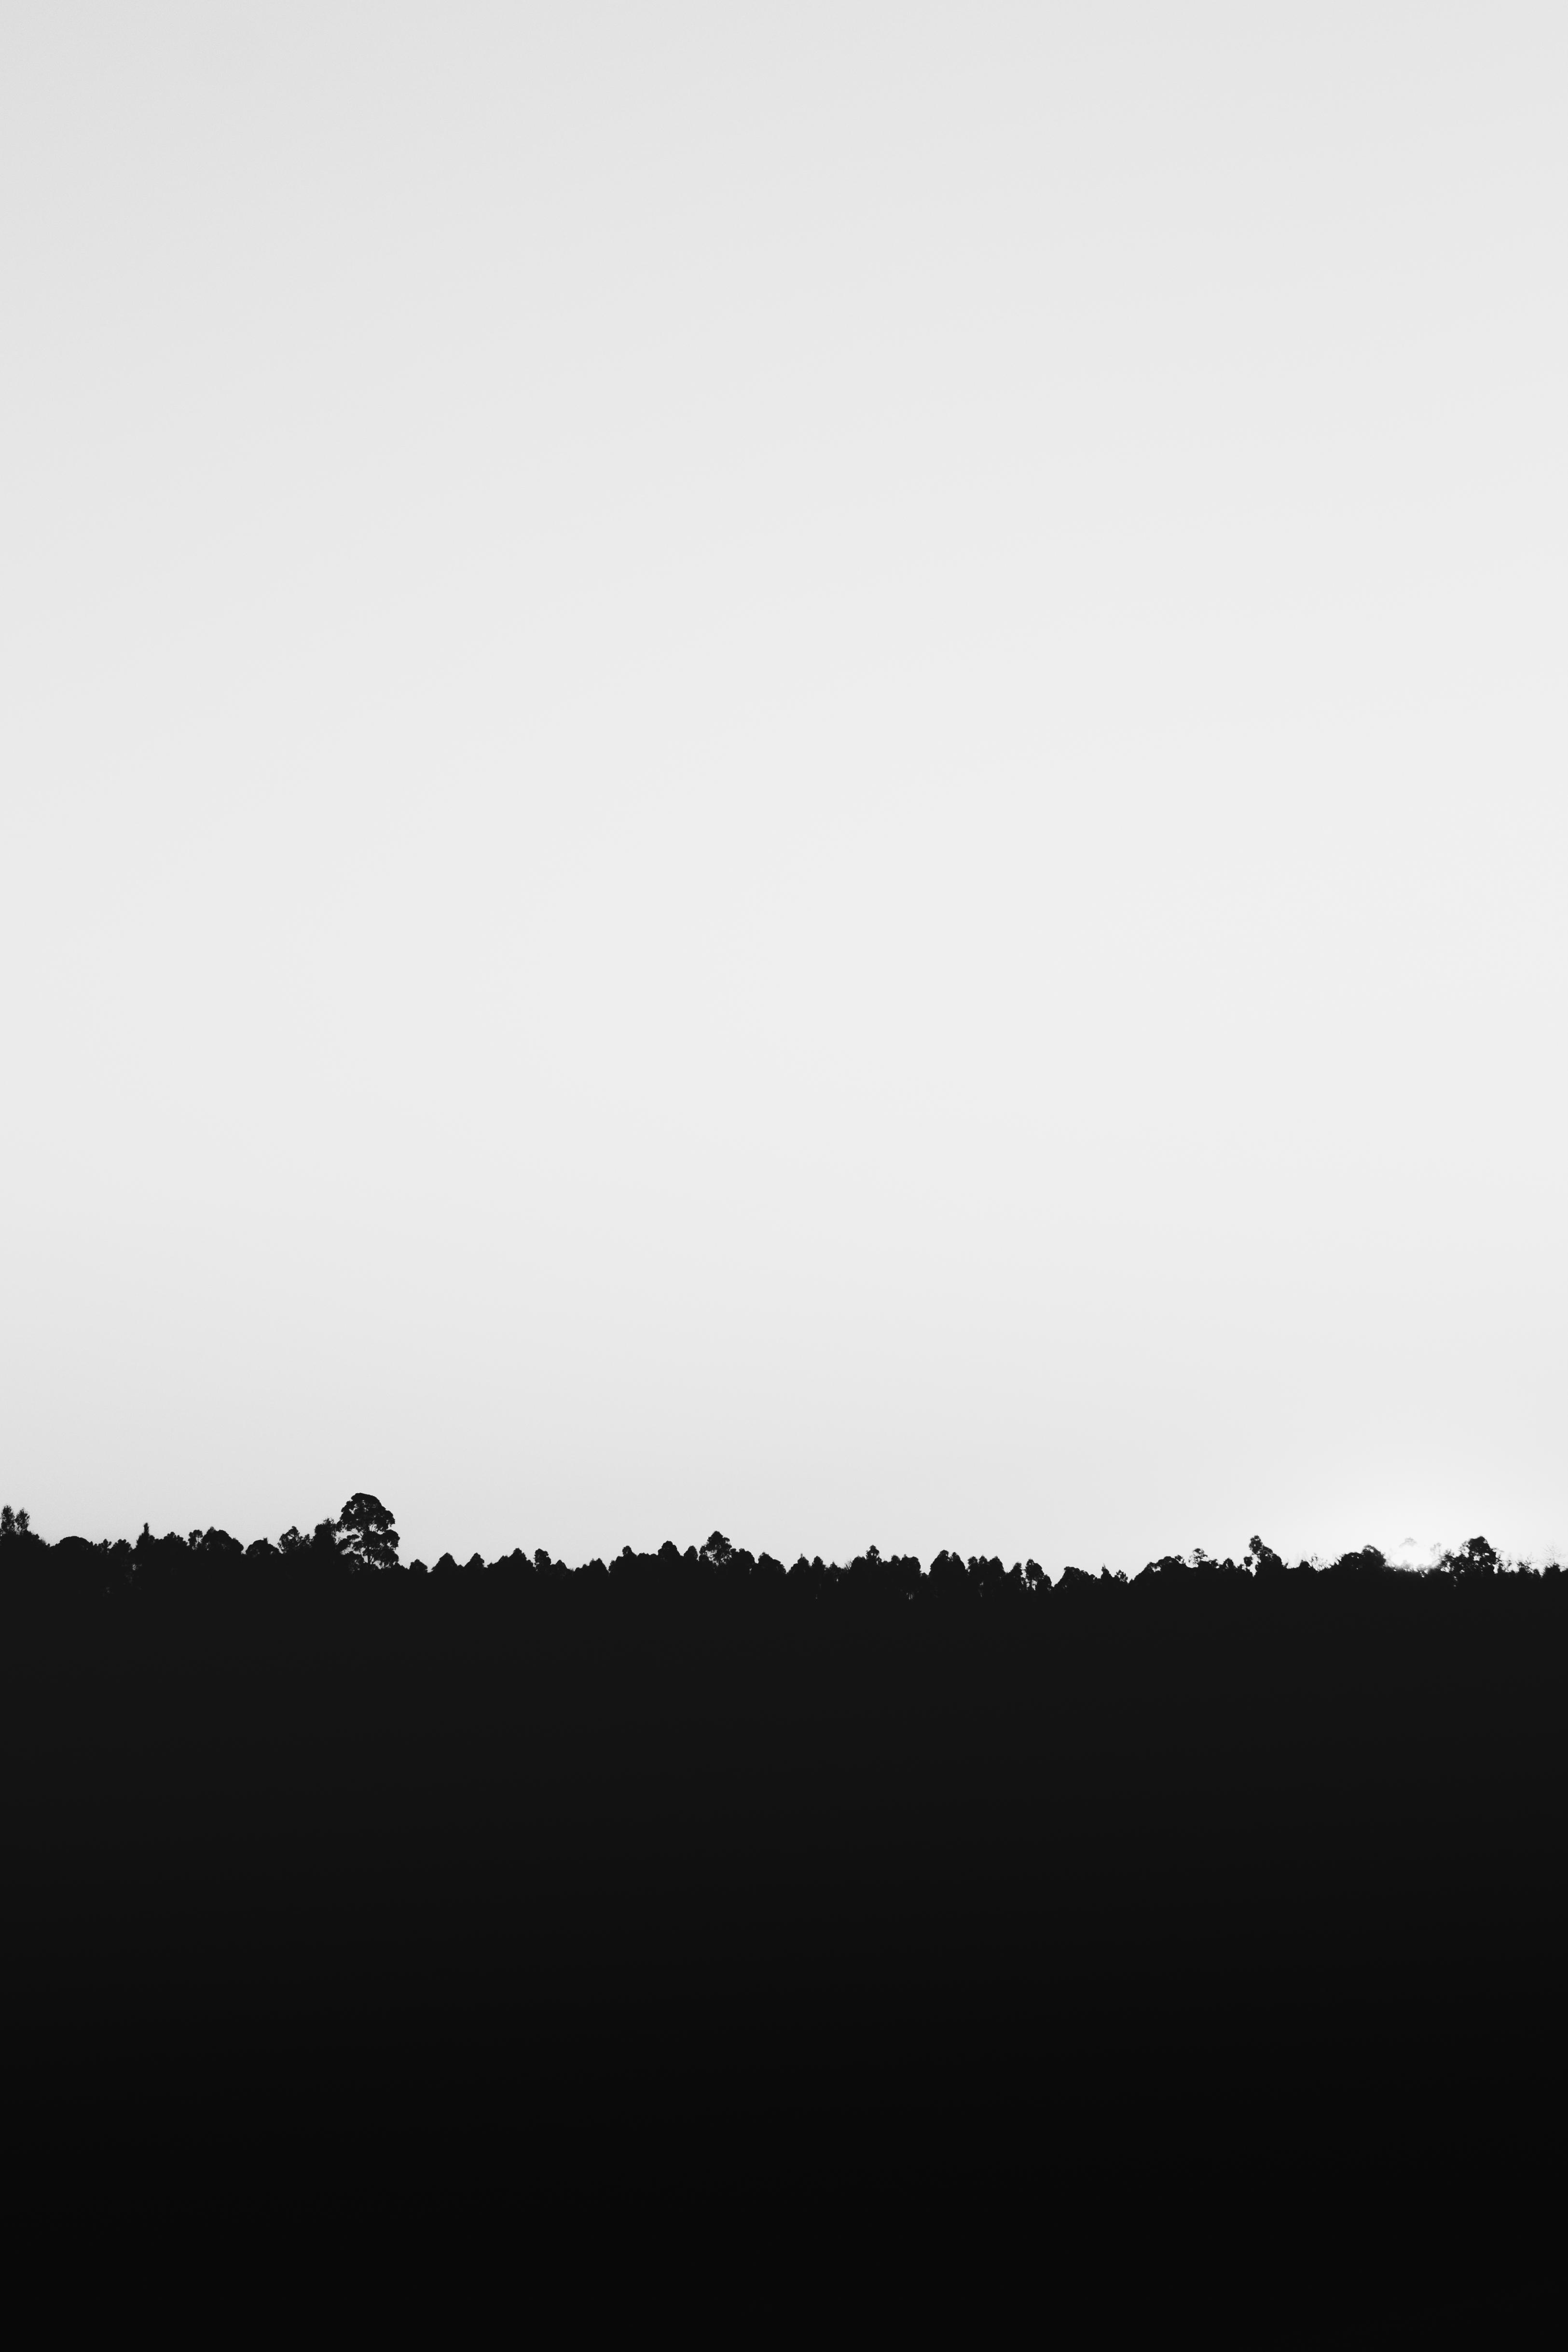 1000 Beautiful Black And White Background Photos Pexels Free Stock Photos